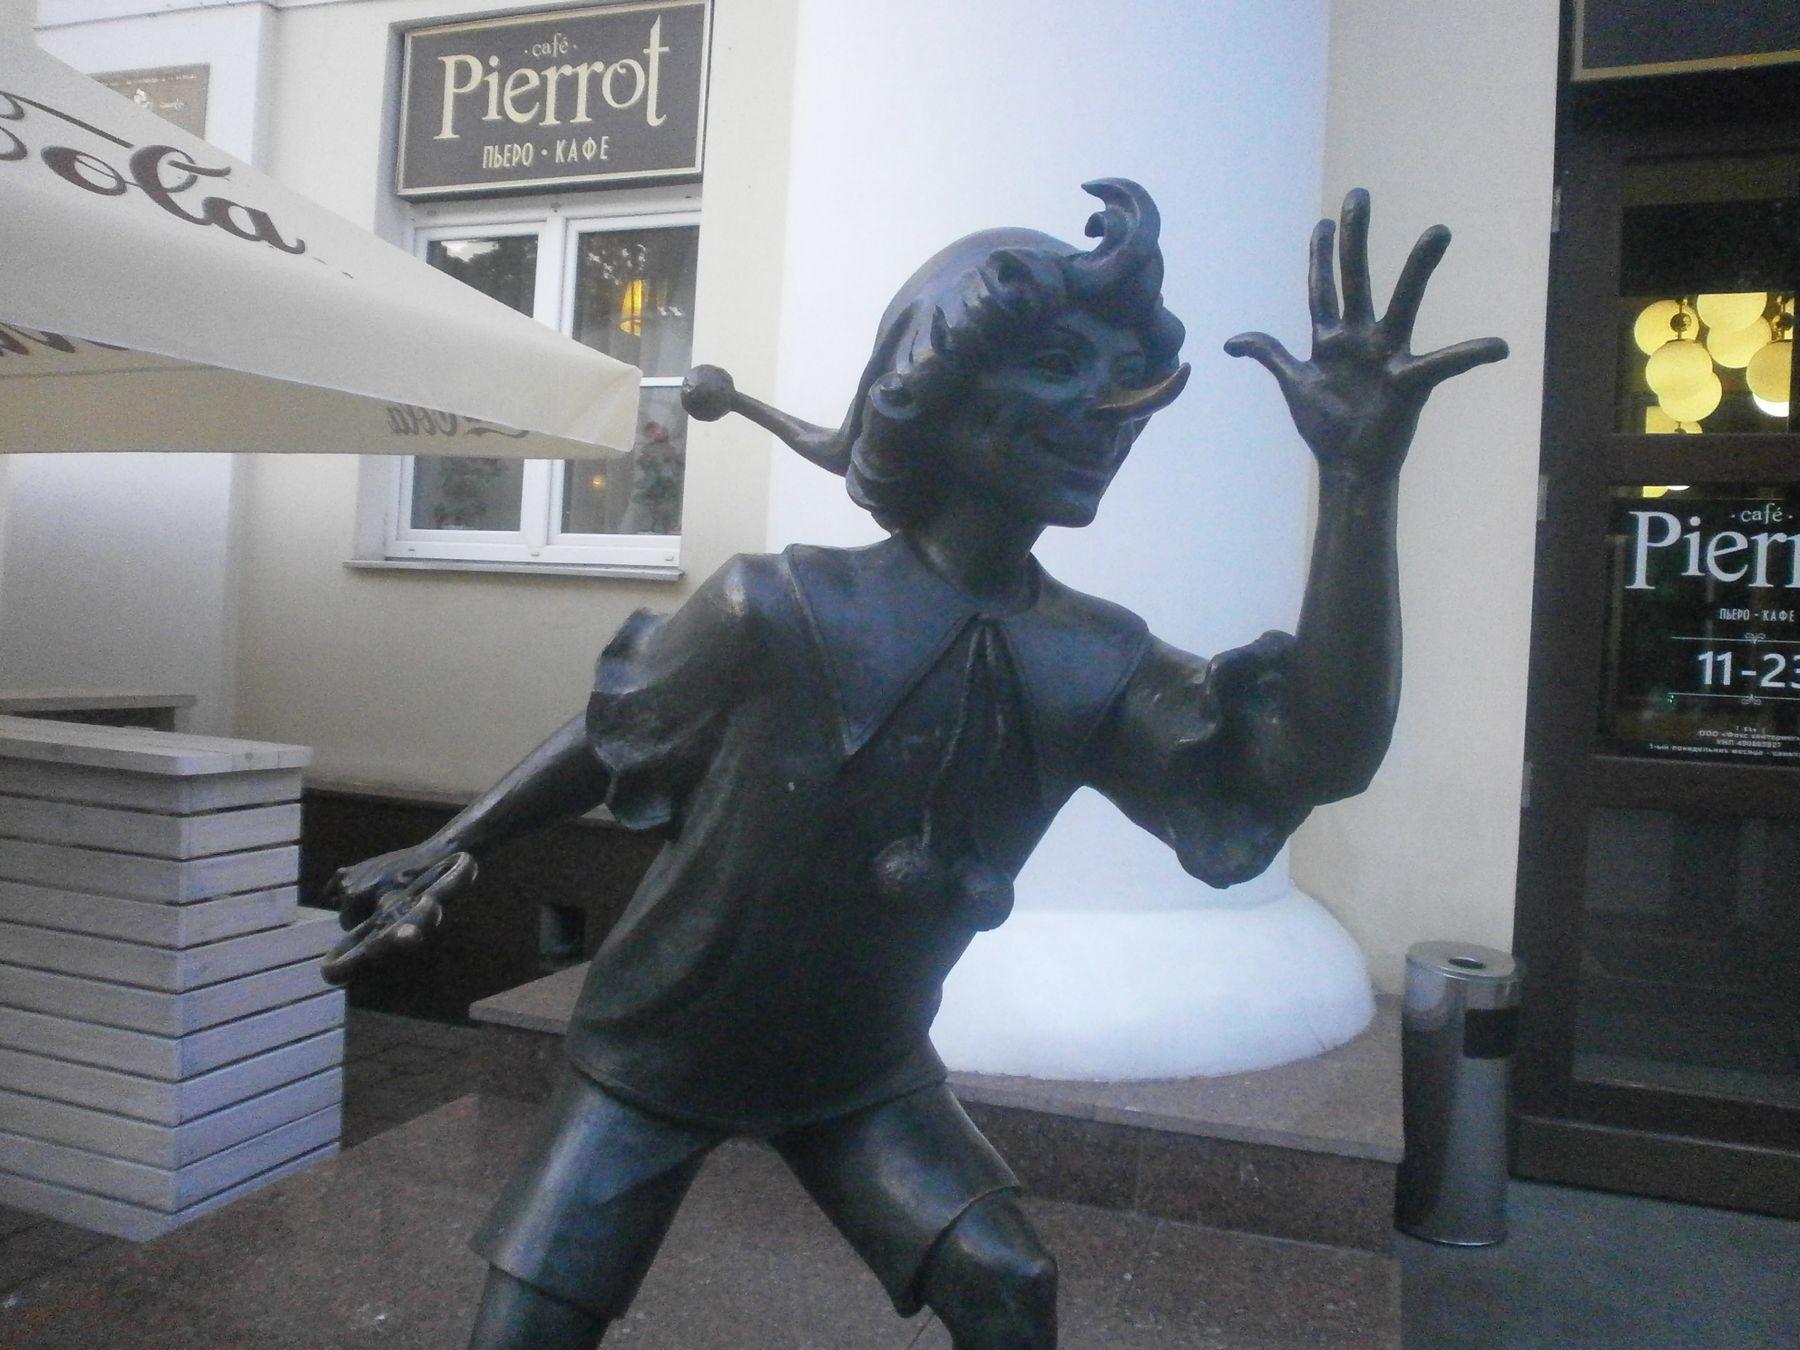 Театр кукол. Гомель, Белоруссия. Гомель